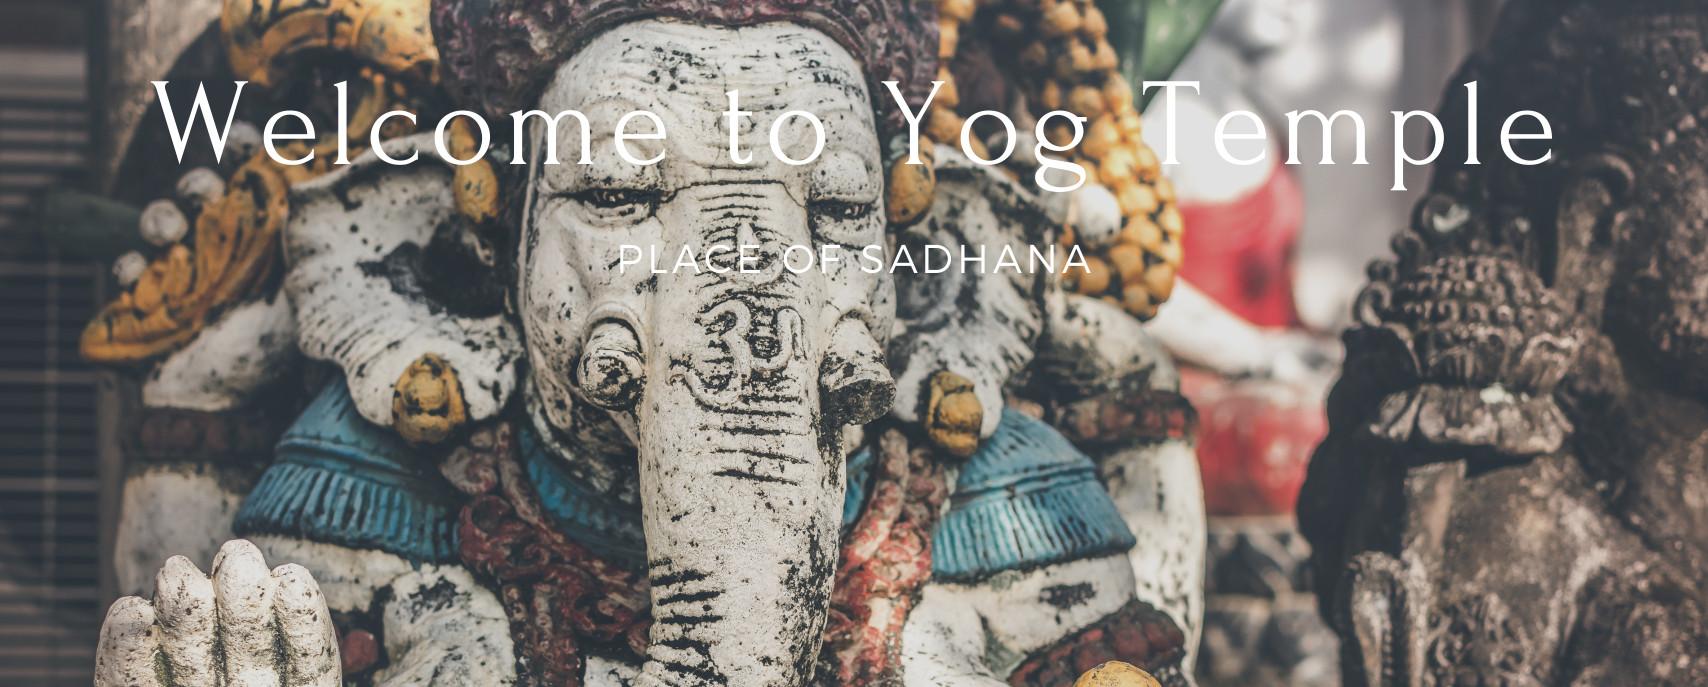 Yog Temple, Yoga Teacher Training in Austria, Yoga in Austria